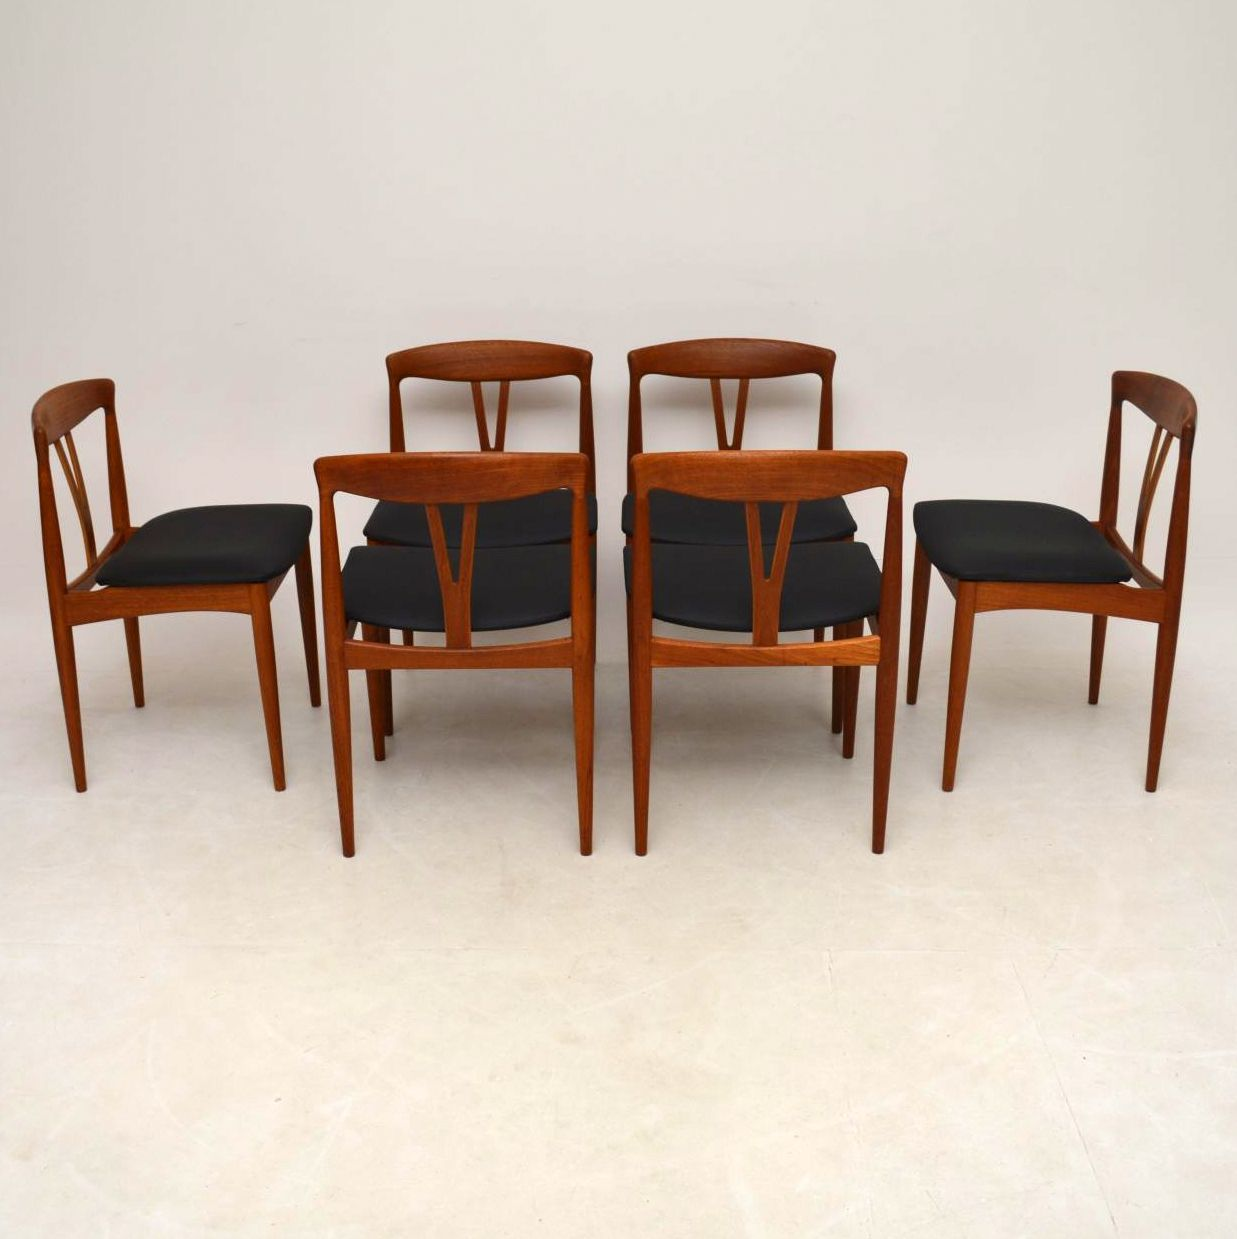 teak retro furniture. set of 6 danish teak retro dining chairs vintage 1960u0027s furniture